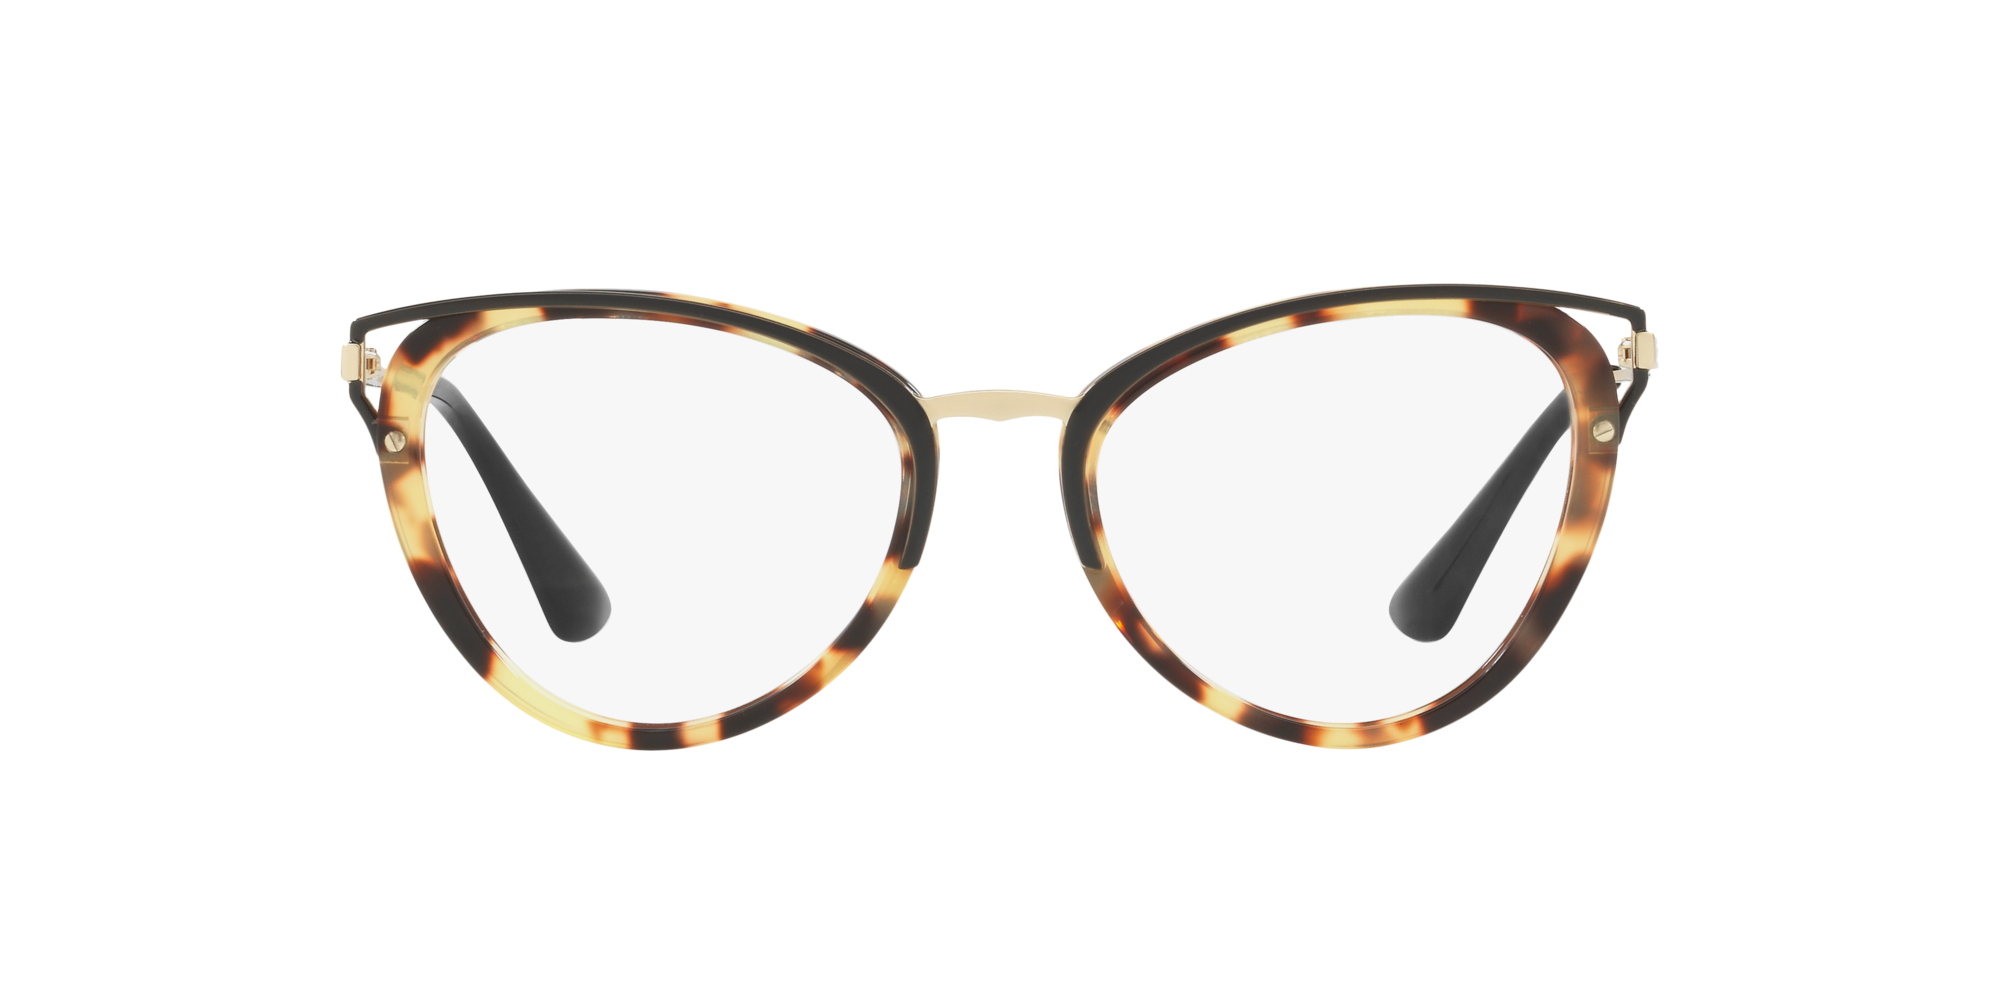 Image for PR 53UV CATWALK from LensCrafters   Glasses, Prescription Glasses Online, Eyewear